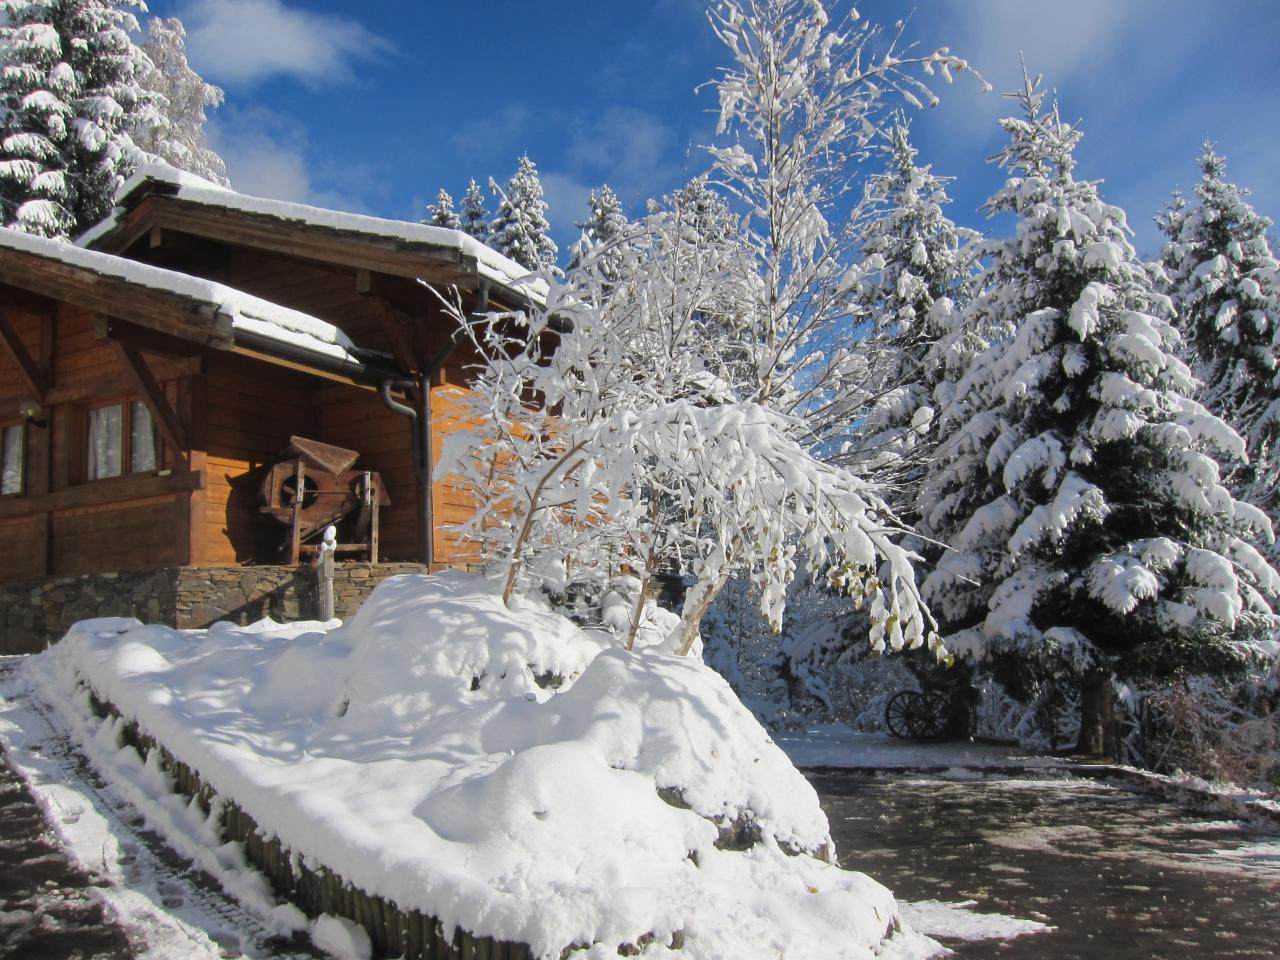 Chalet en hiver (2)